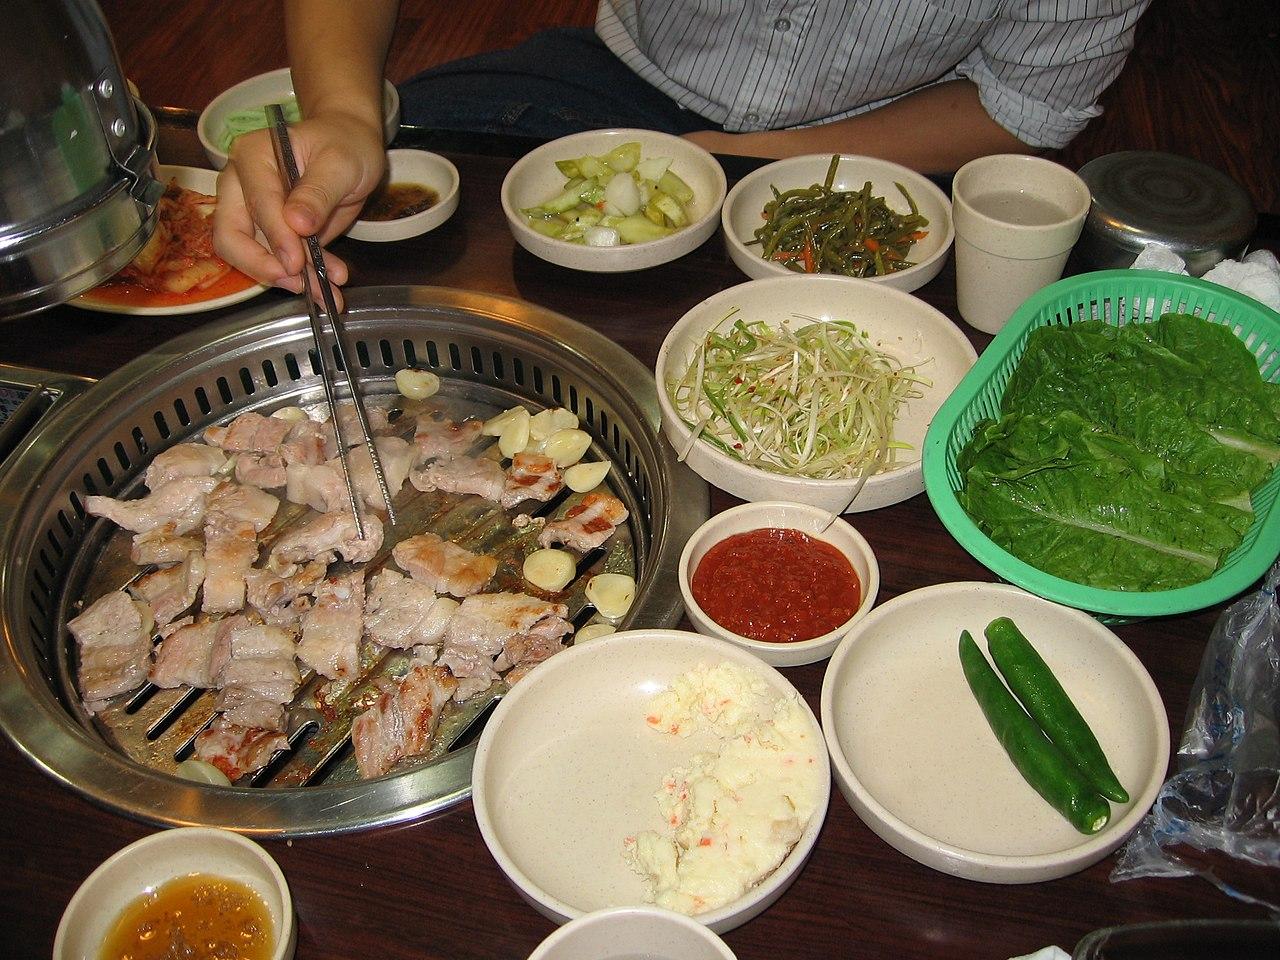 https://upload.wikimedia.org/wikipedia/commons/thumb/2/28/Korean_food_8.jpg/1280px-Korean_food_8.jpg